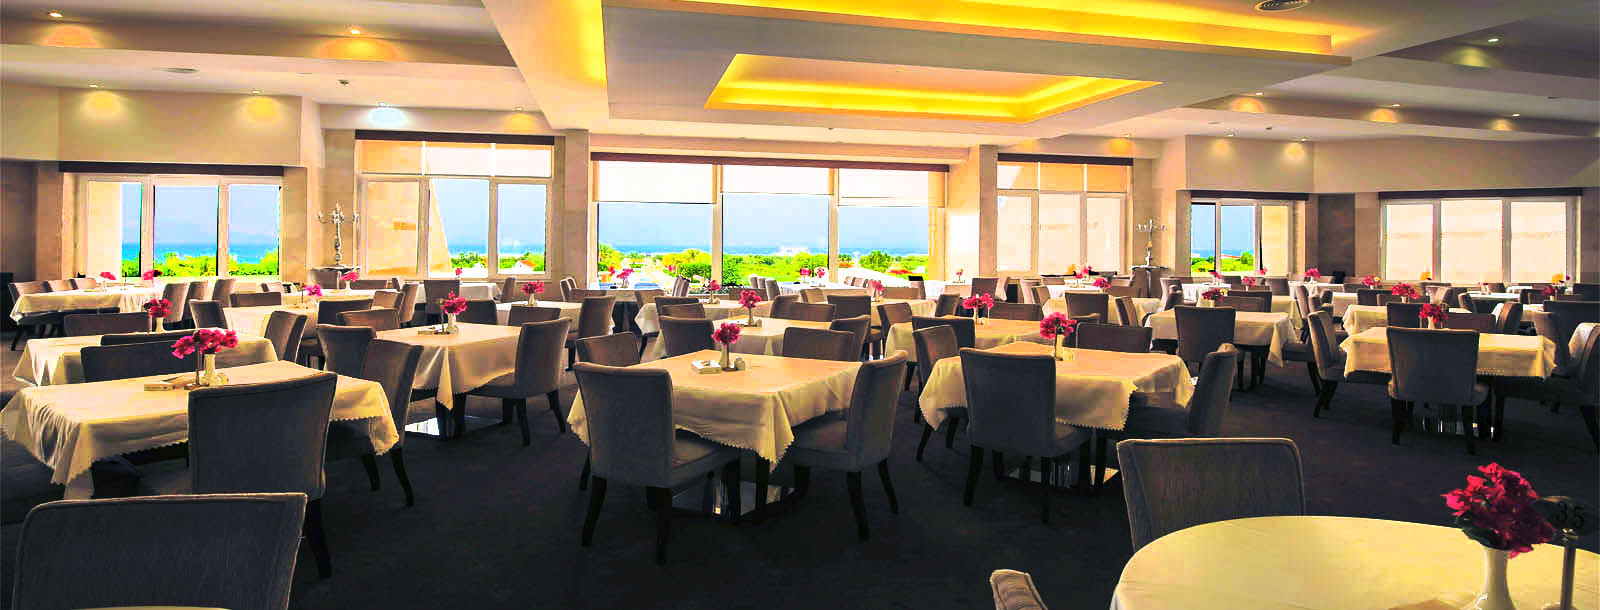 رستوران هتل مارینا کیش